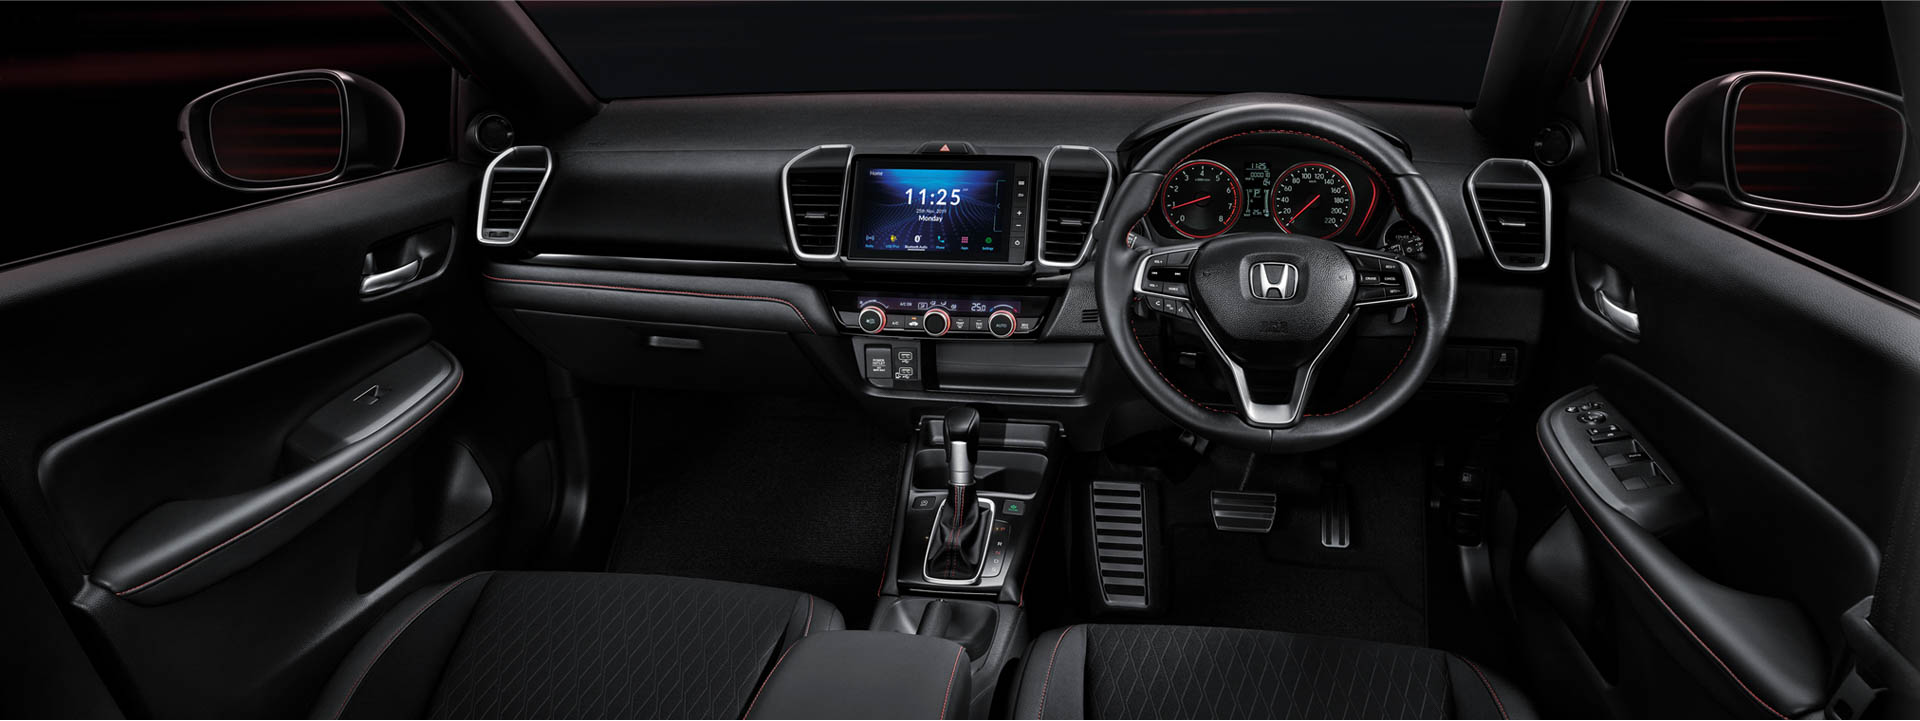 Honda City Interior